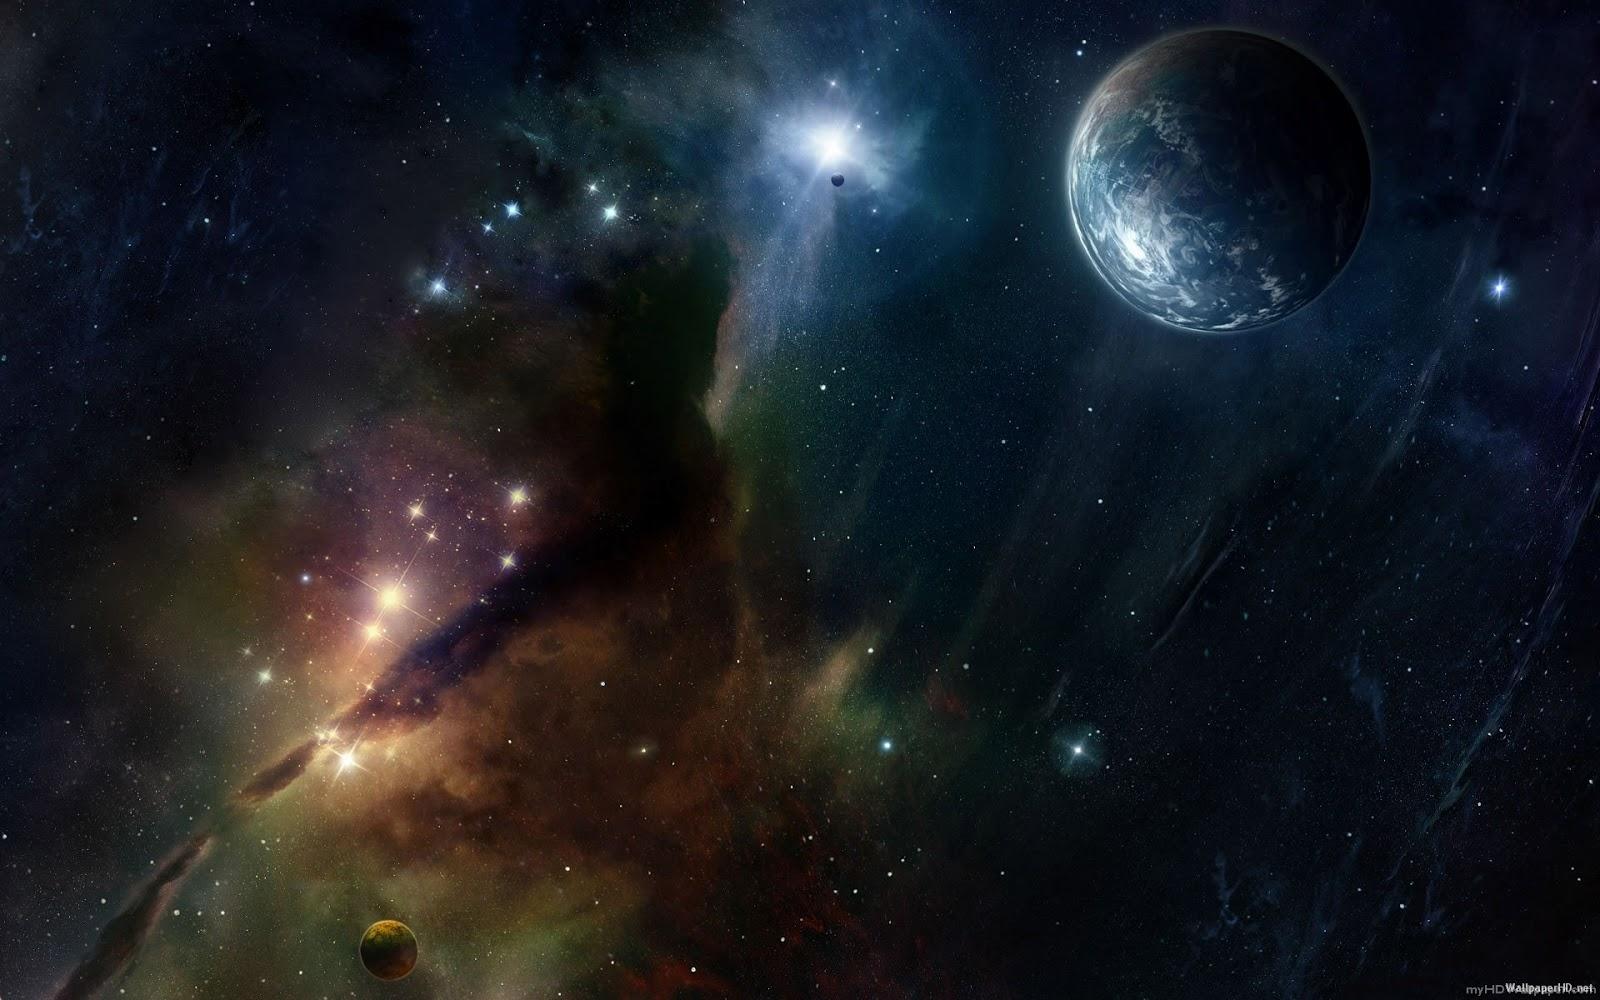 wallpaper planet wallpaper hd planets hd wallpaper planets wallpaper 1600x1000